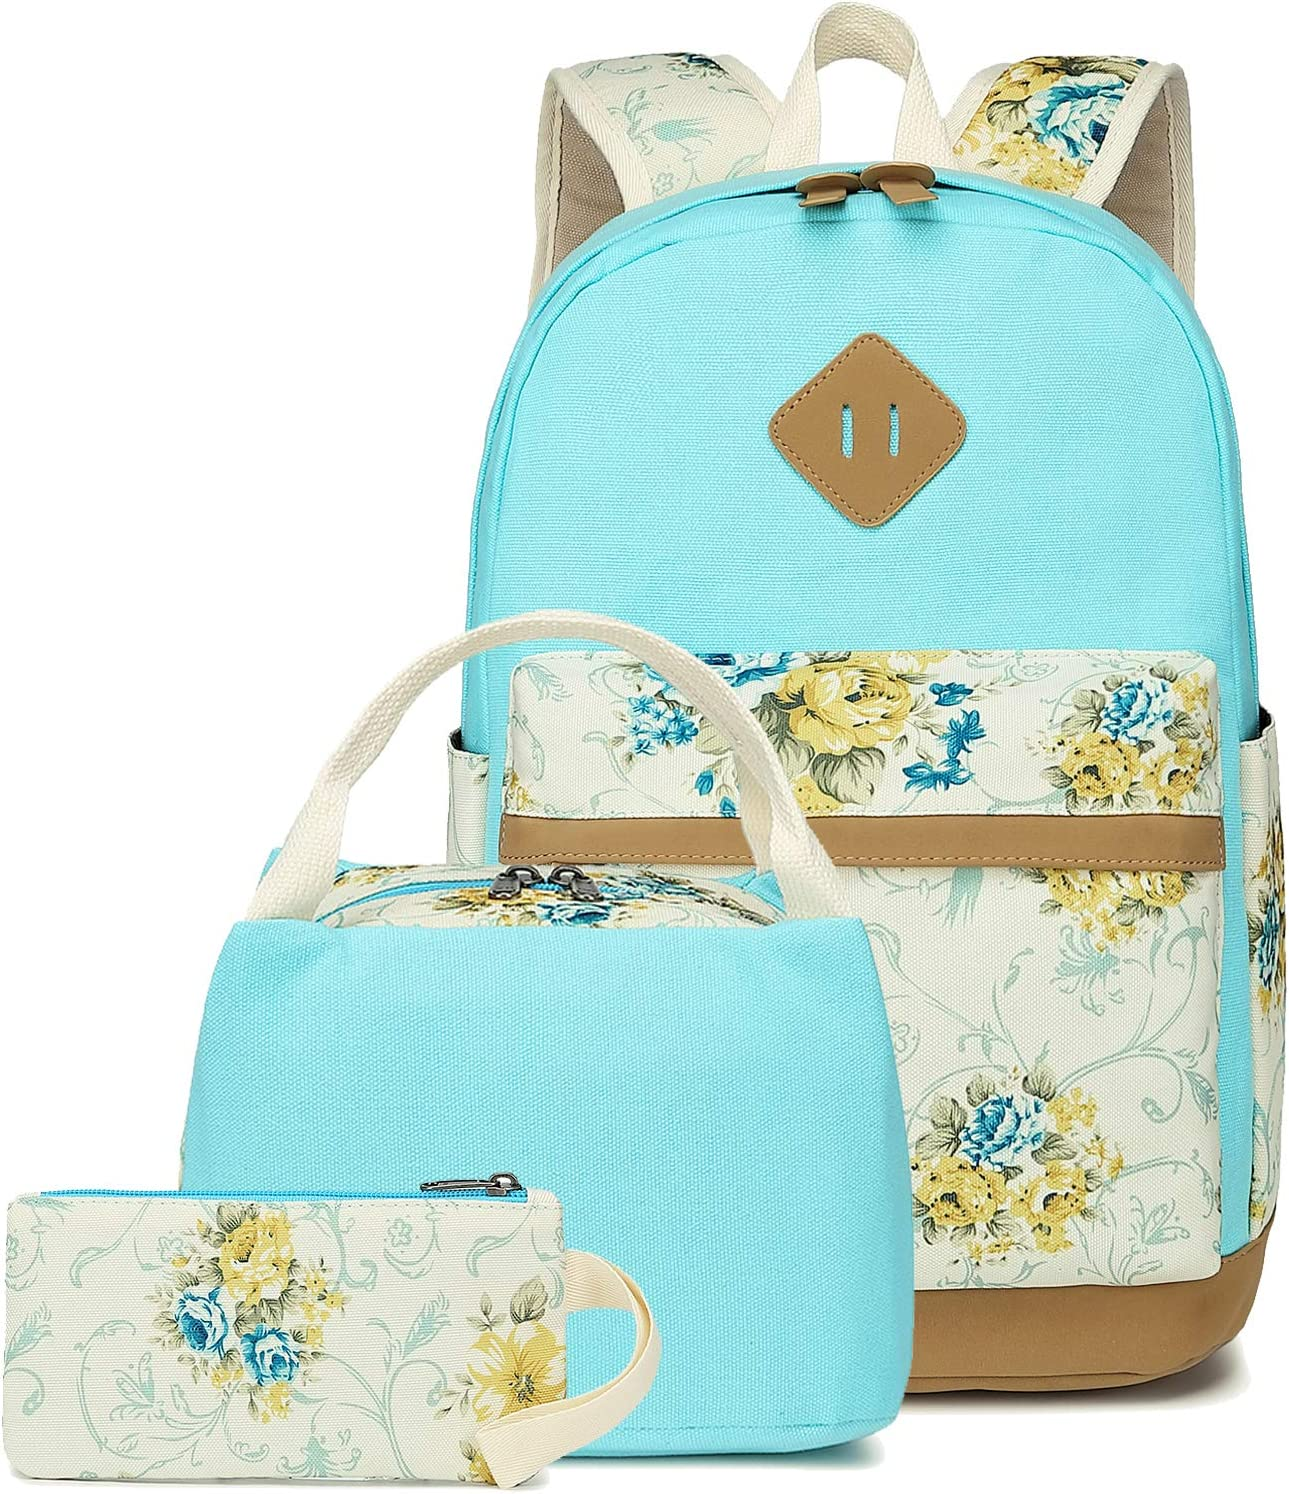 School Backpacks for Teen Girls Lightweight Canvas Backpack Bookbags Set (Light Blue-1)